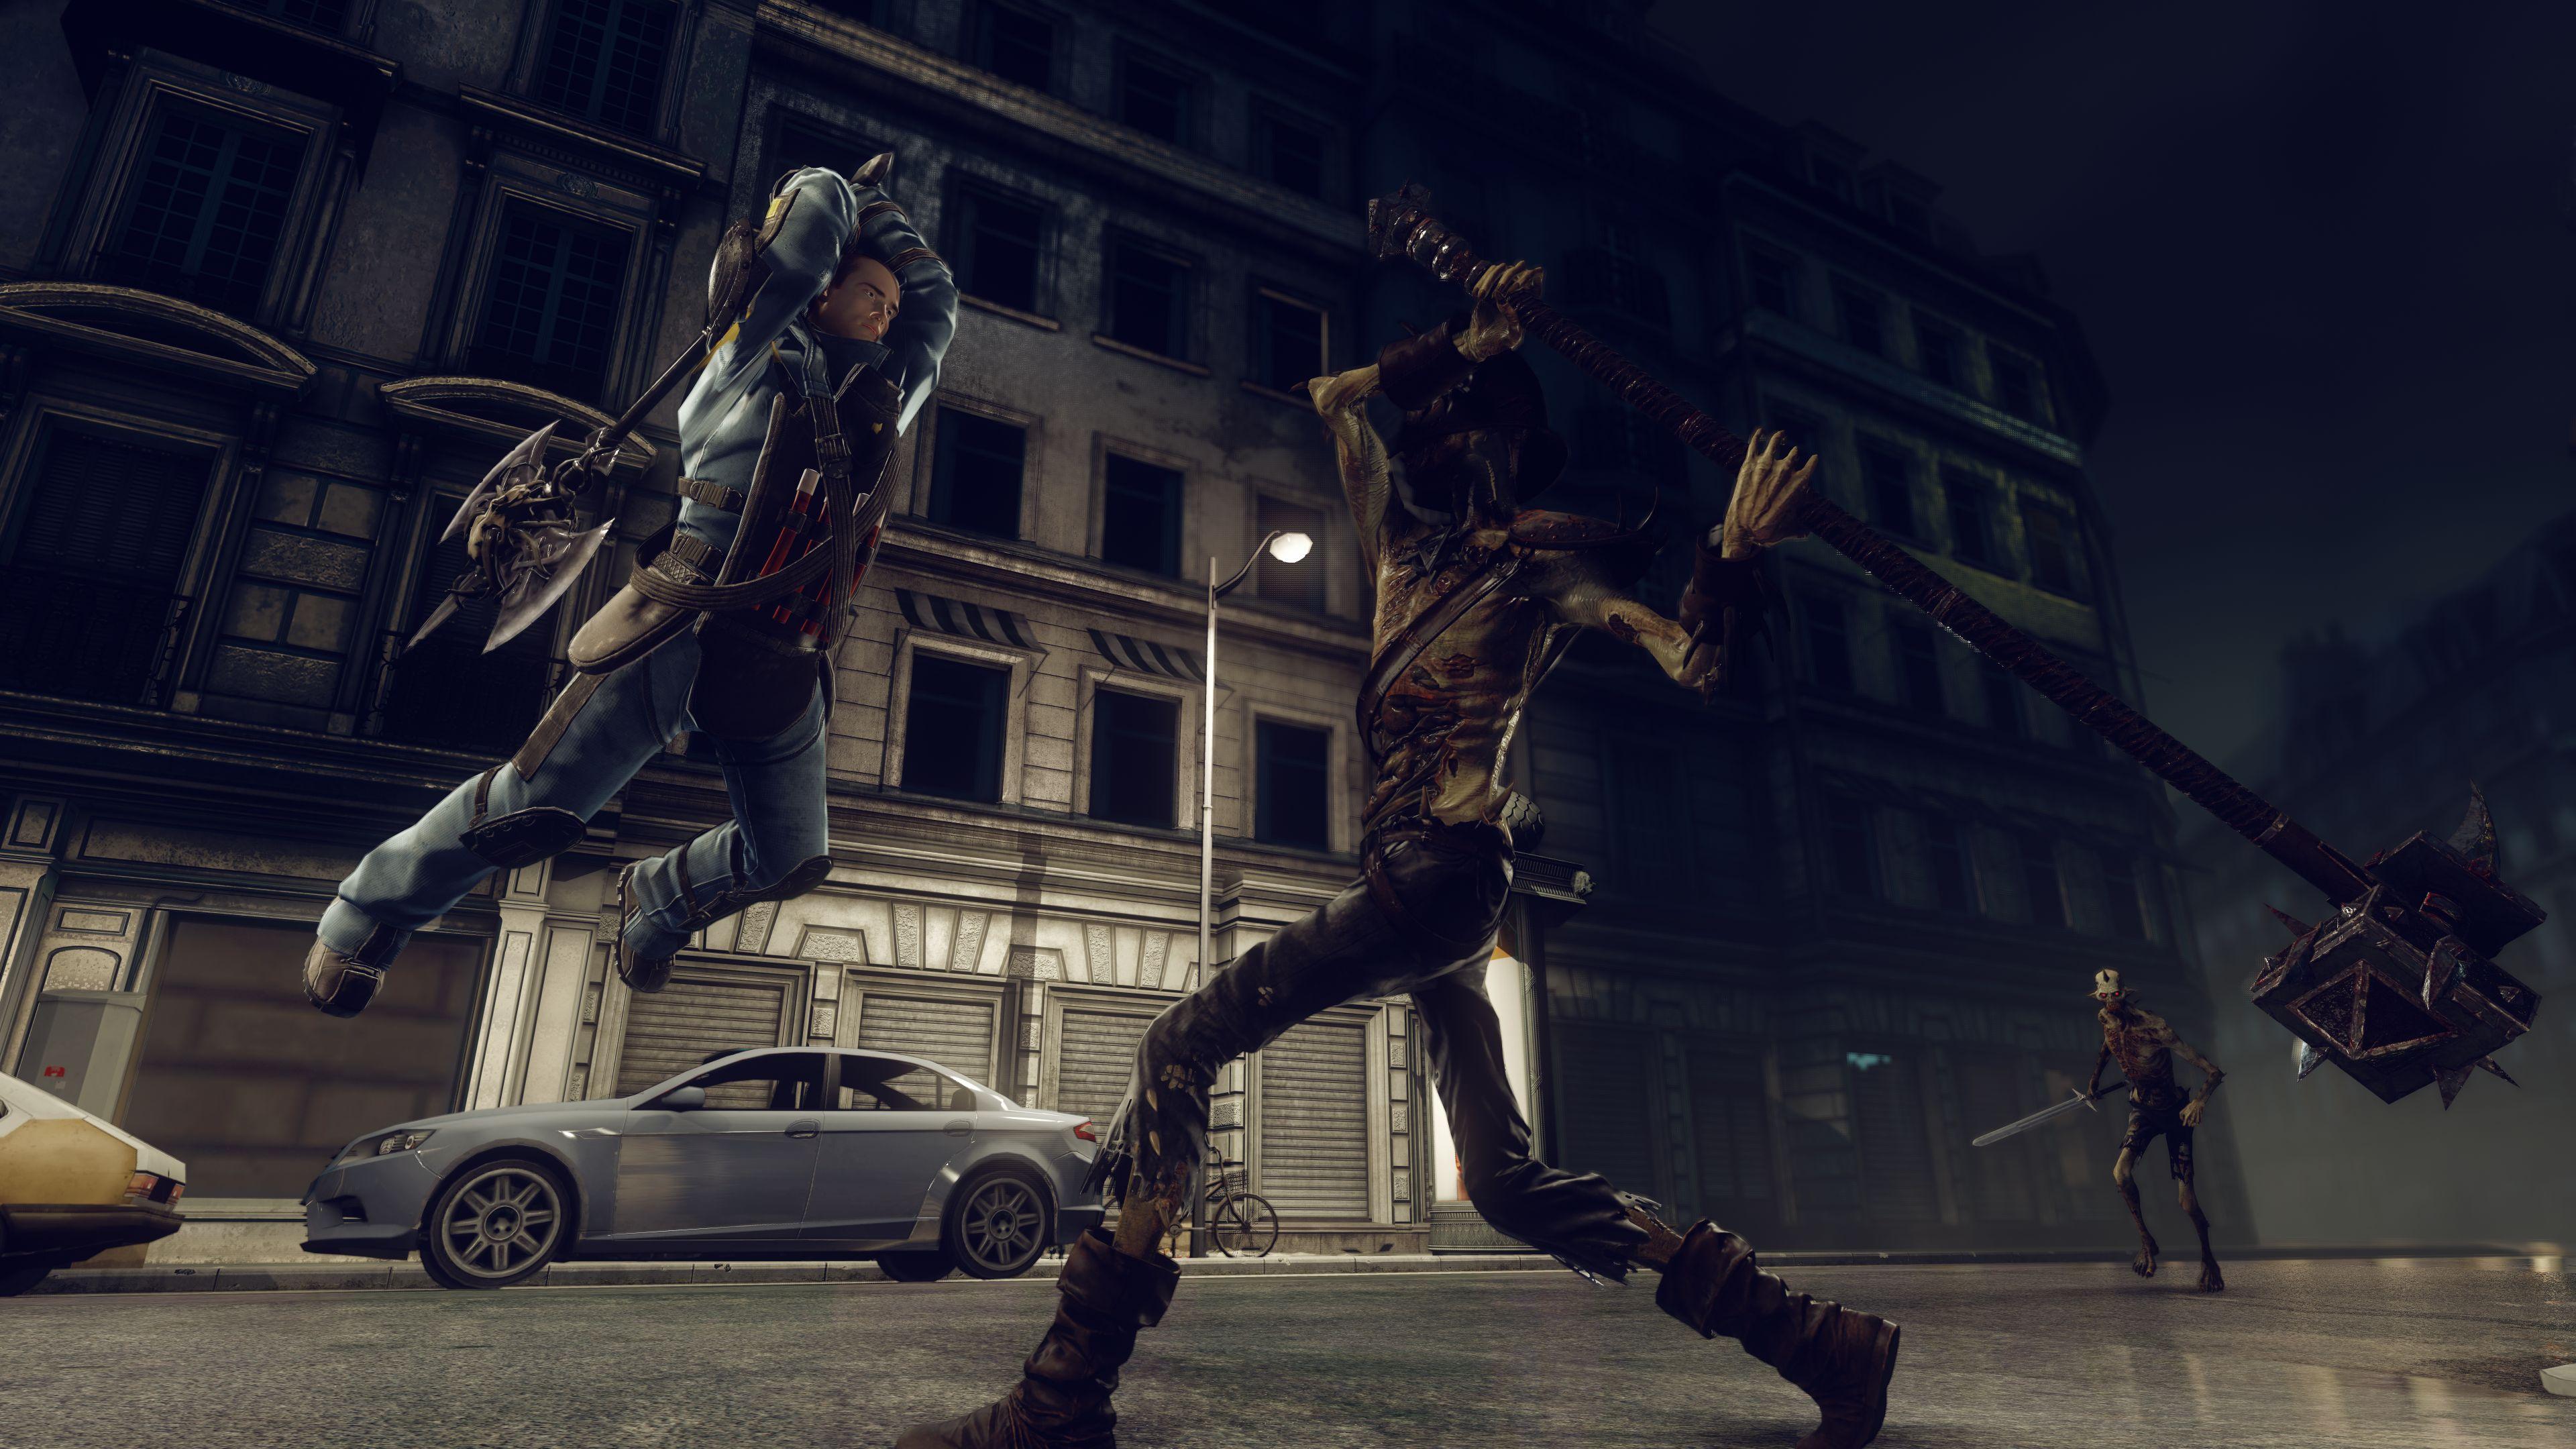 Shadow Realms - not BioWare's normal sort of RPG